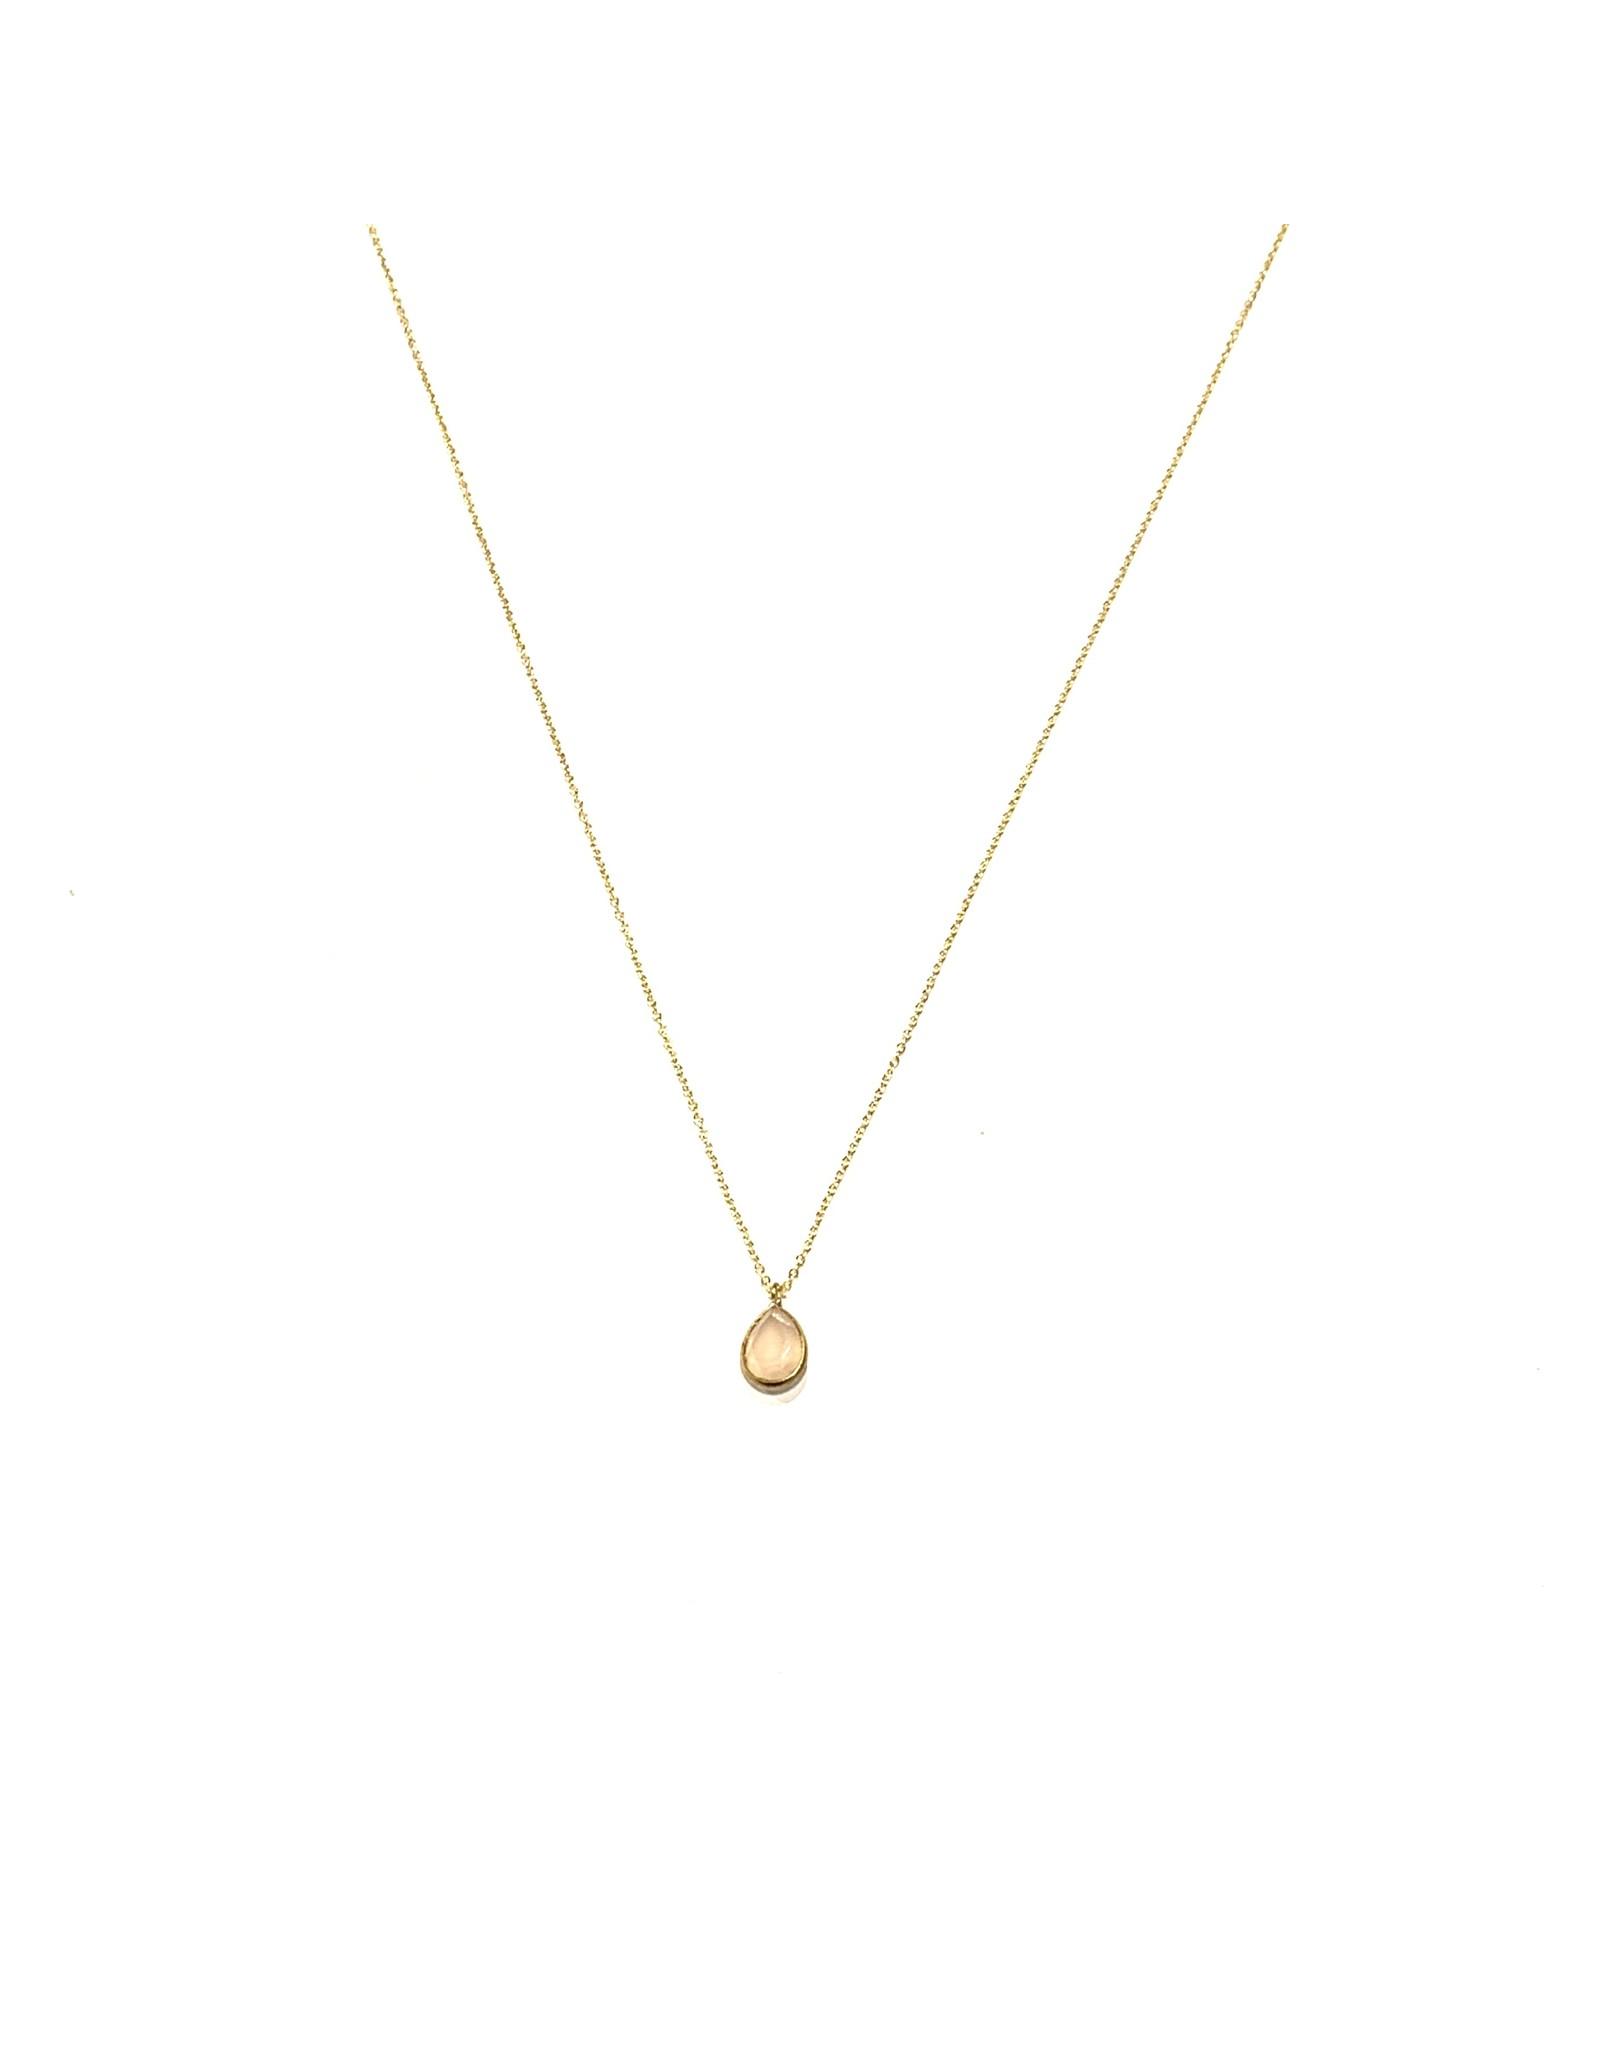 Bo Gold Necklace - Gold - Rose quartz